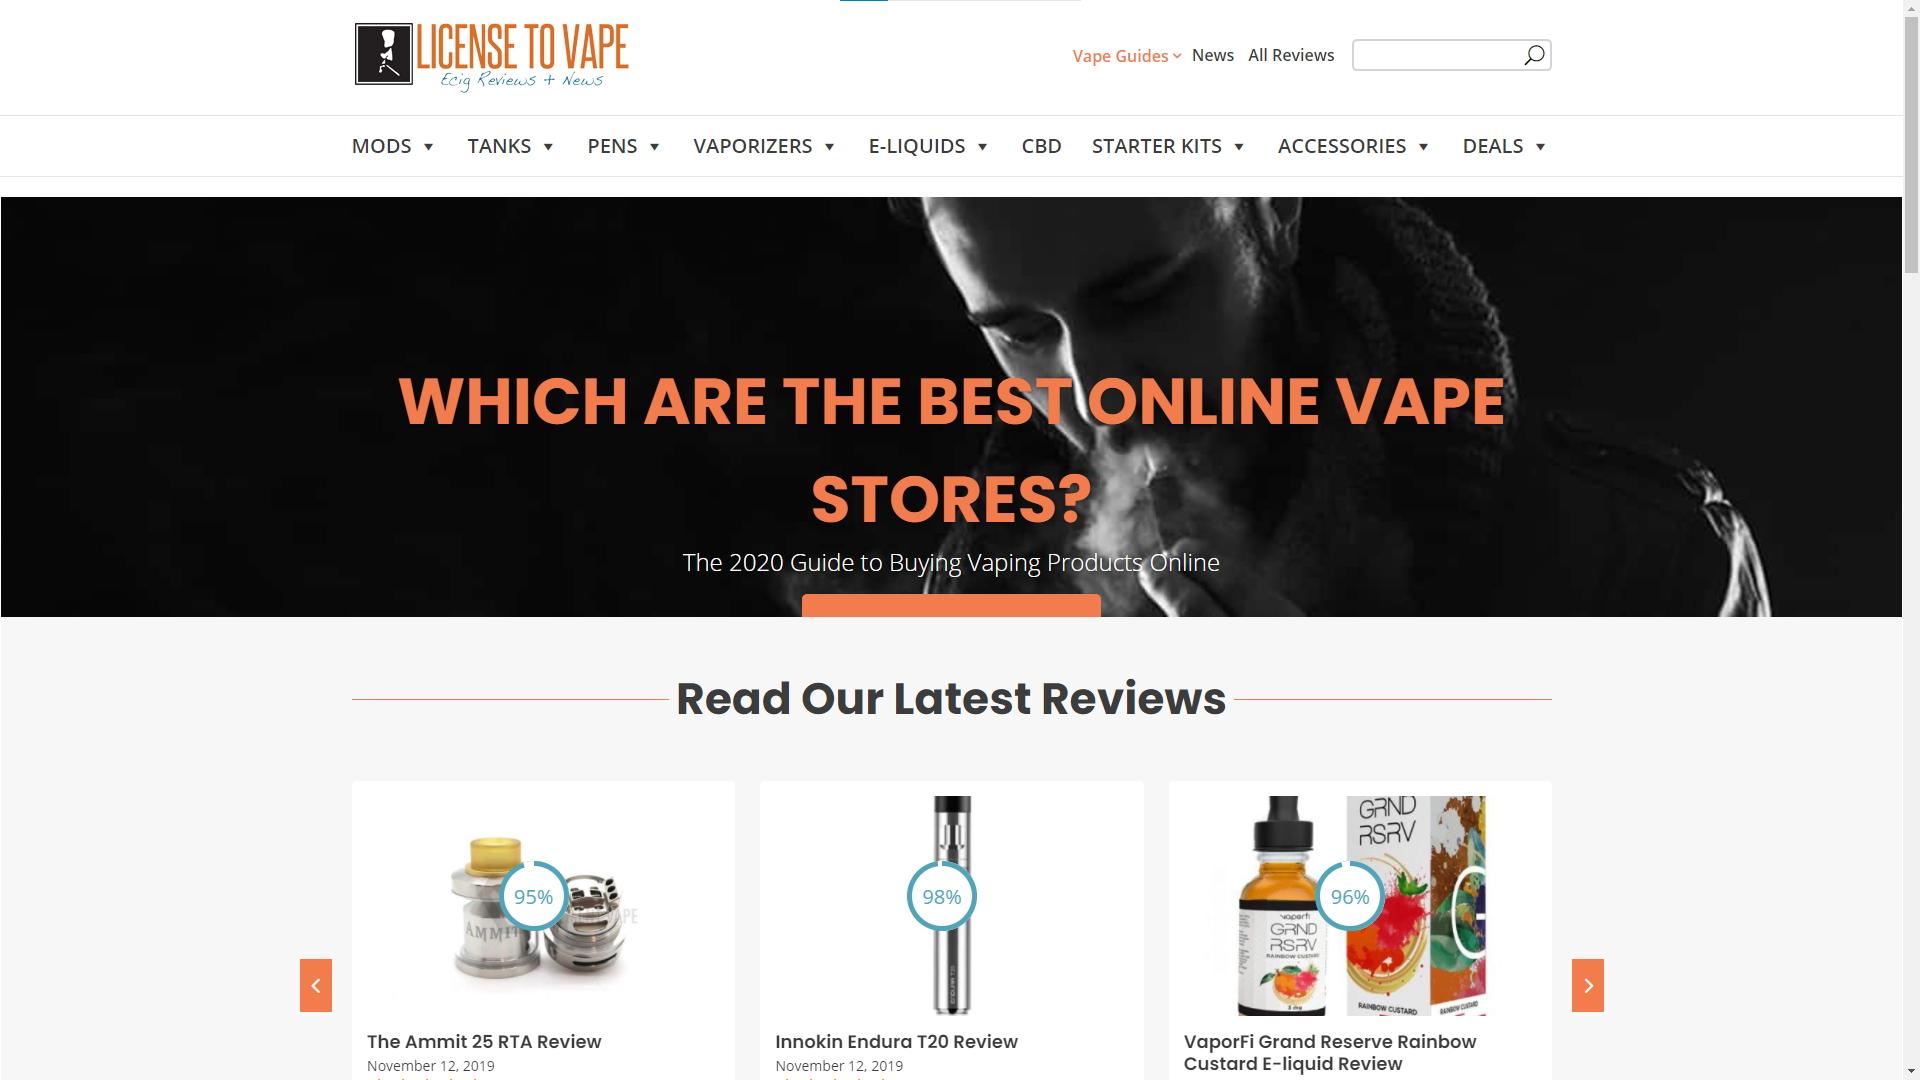 license to vape homepage